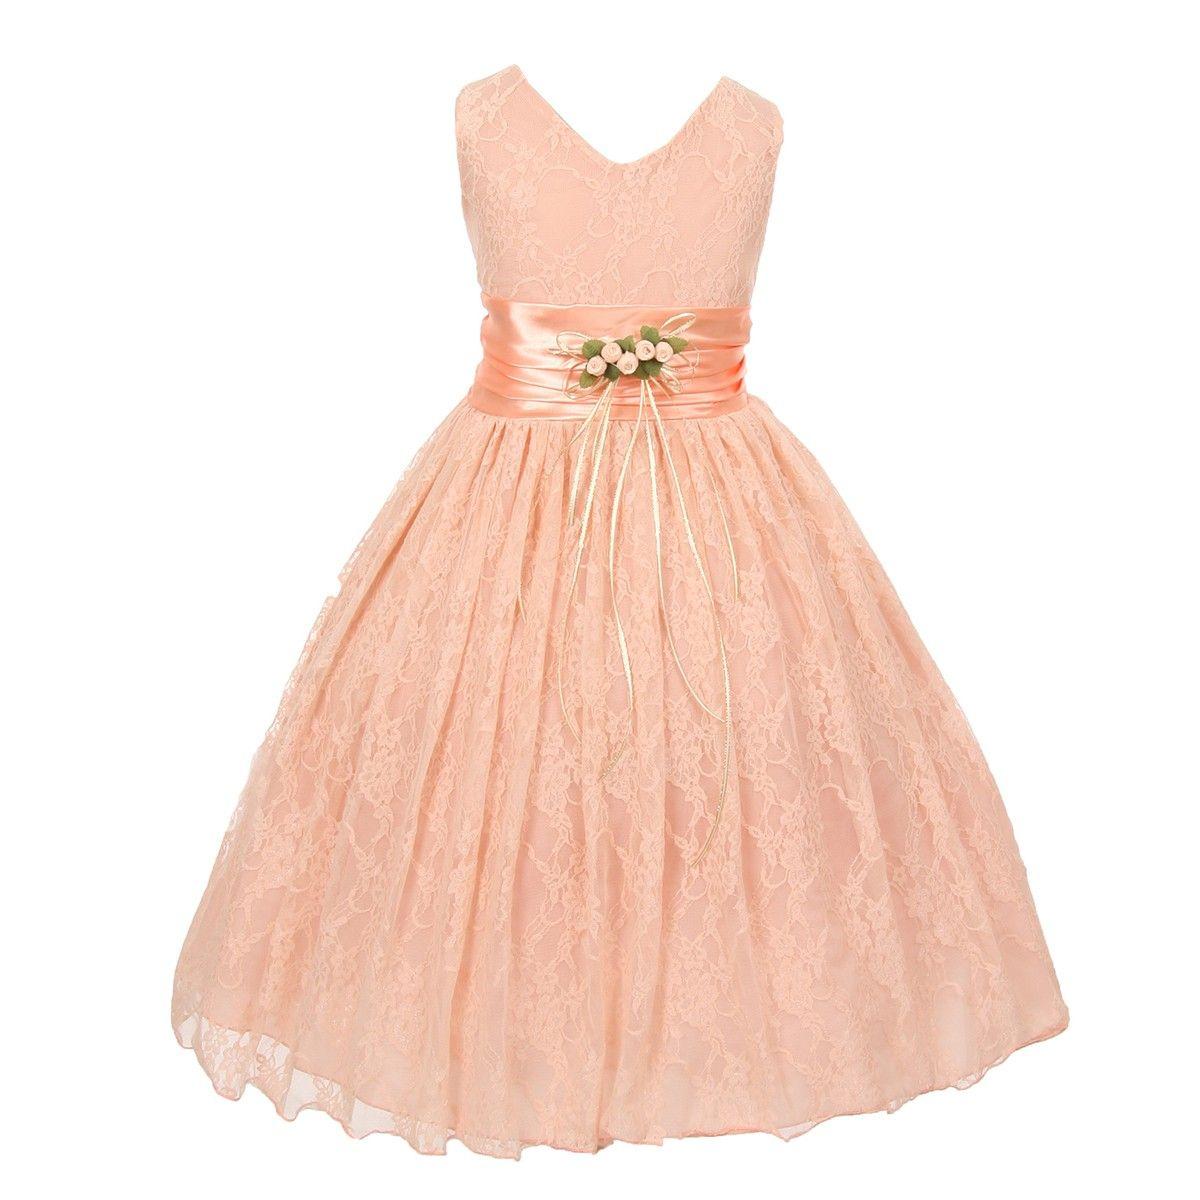 Flower Girls Peach Party Occasion Wear Dress